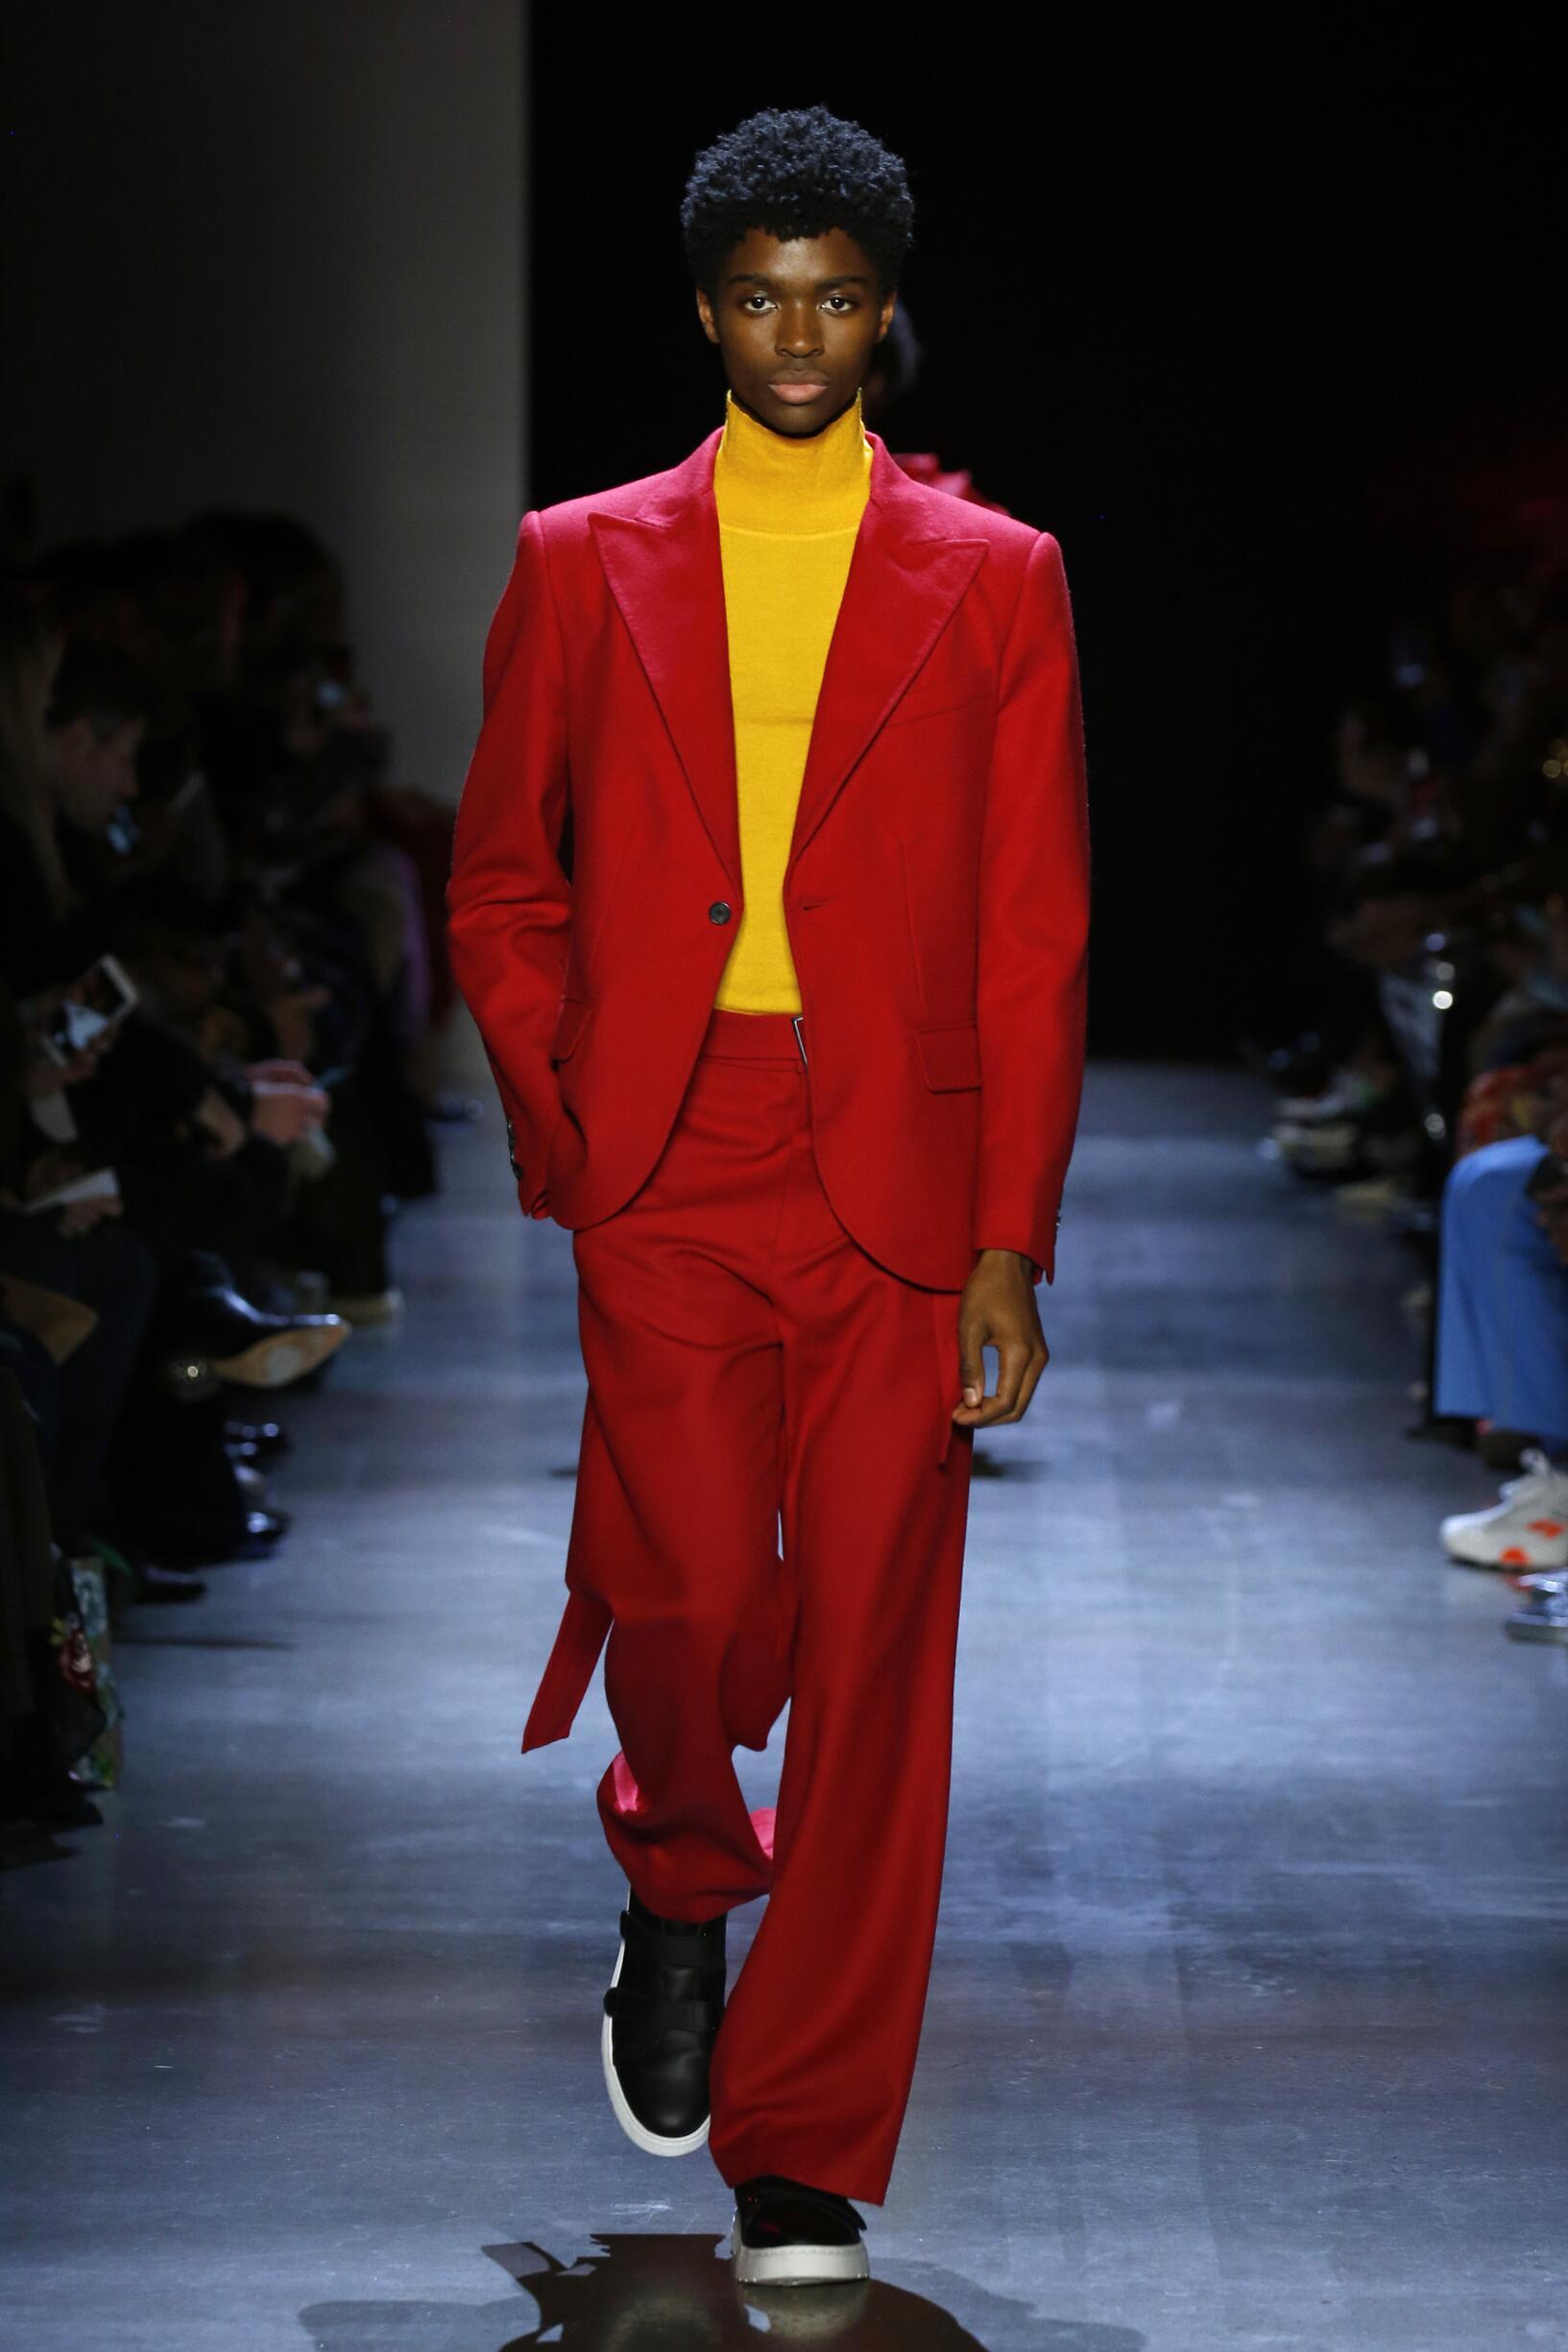 Prabal Gurung FW 2019 Menswear